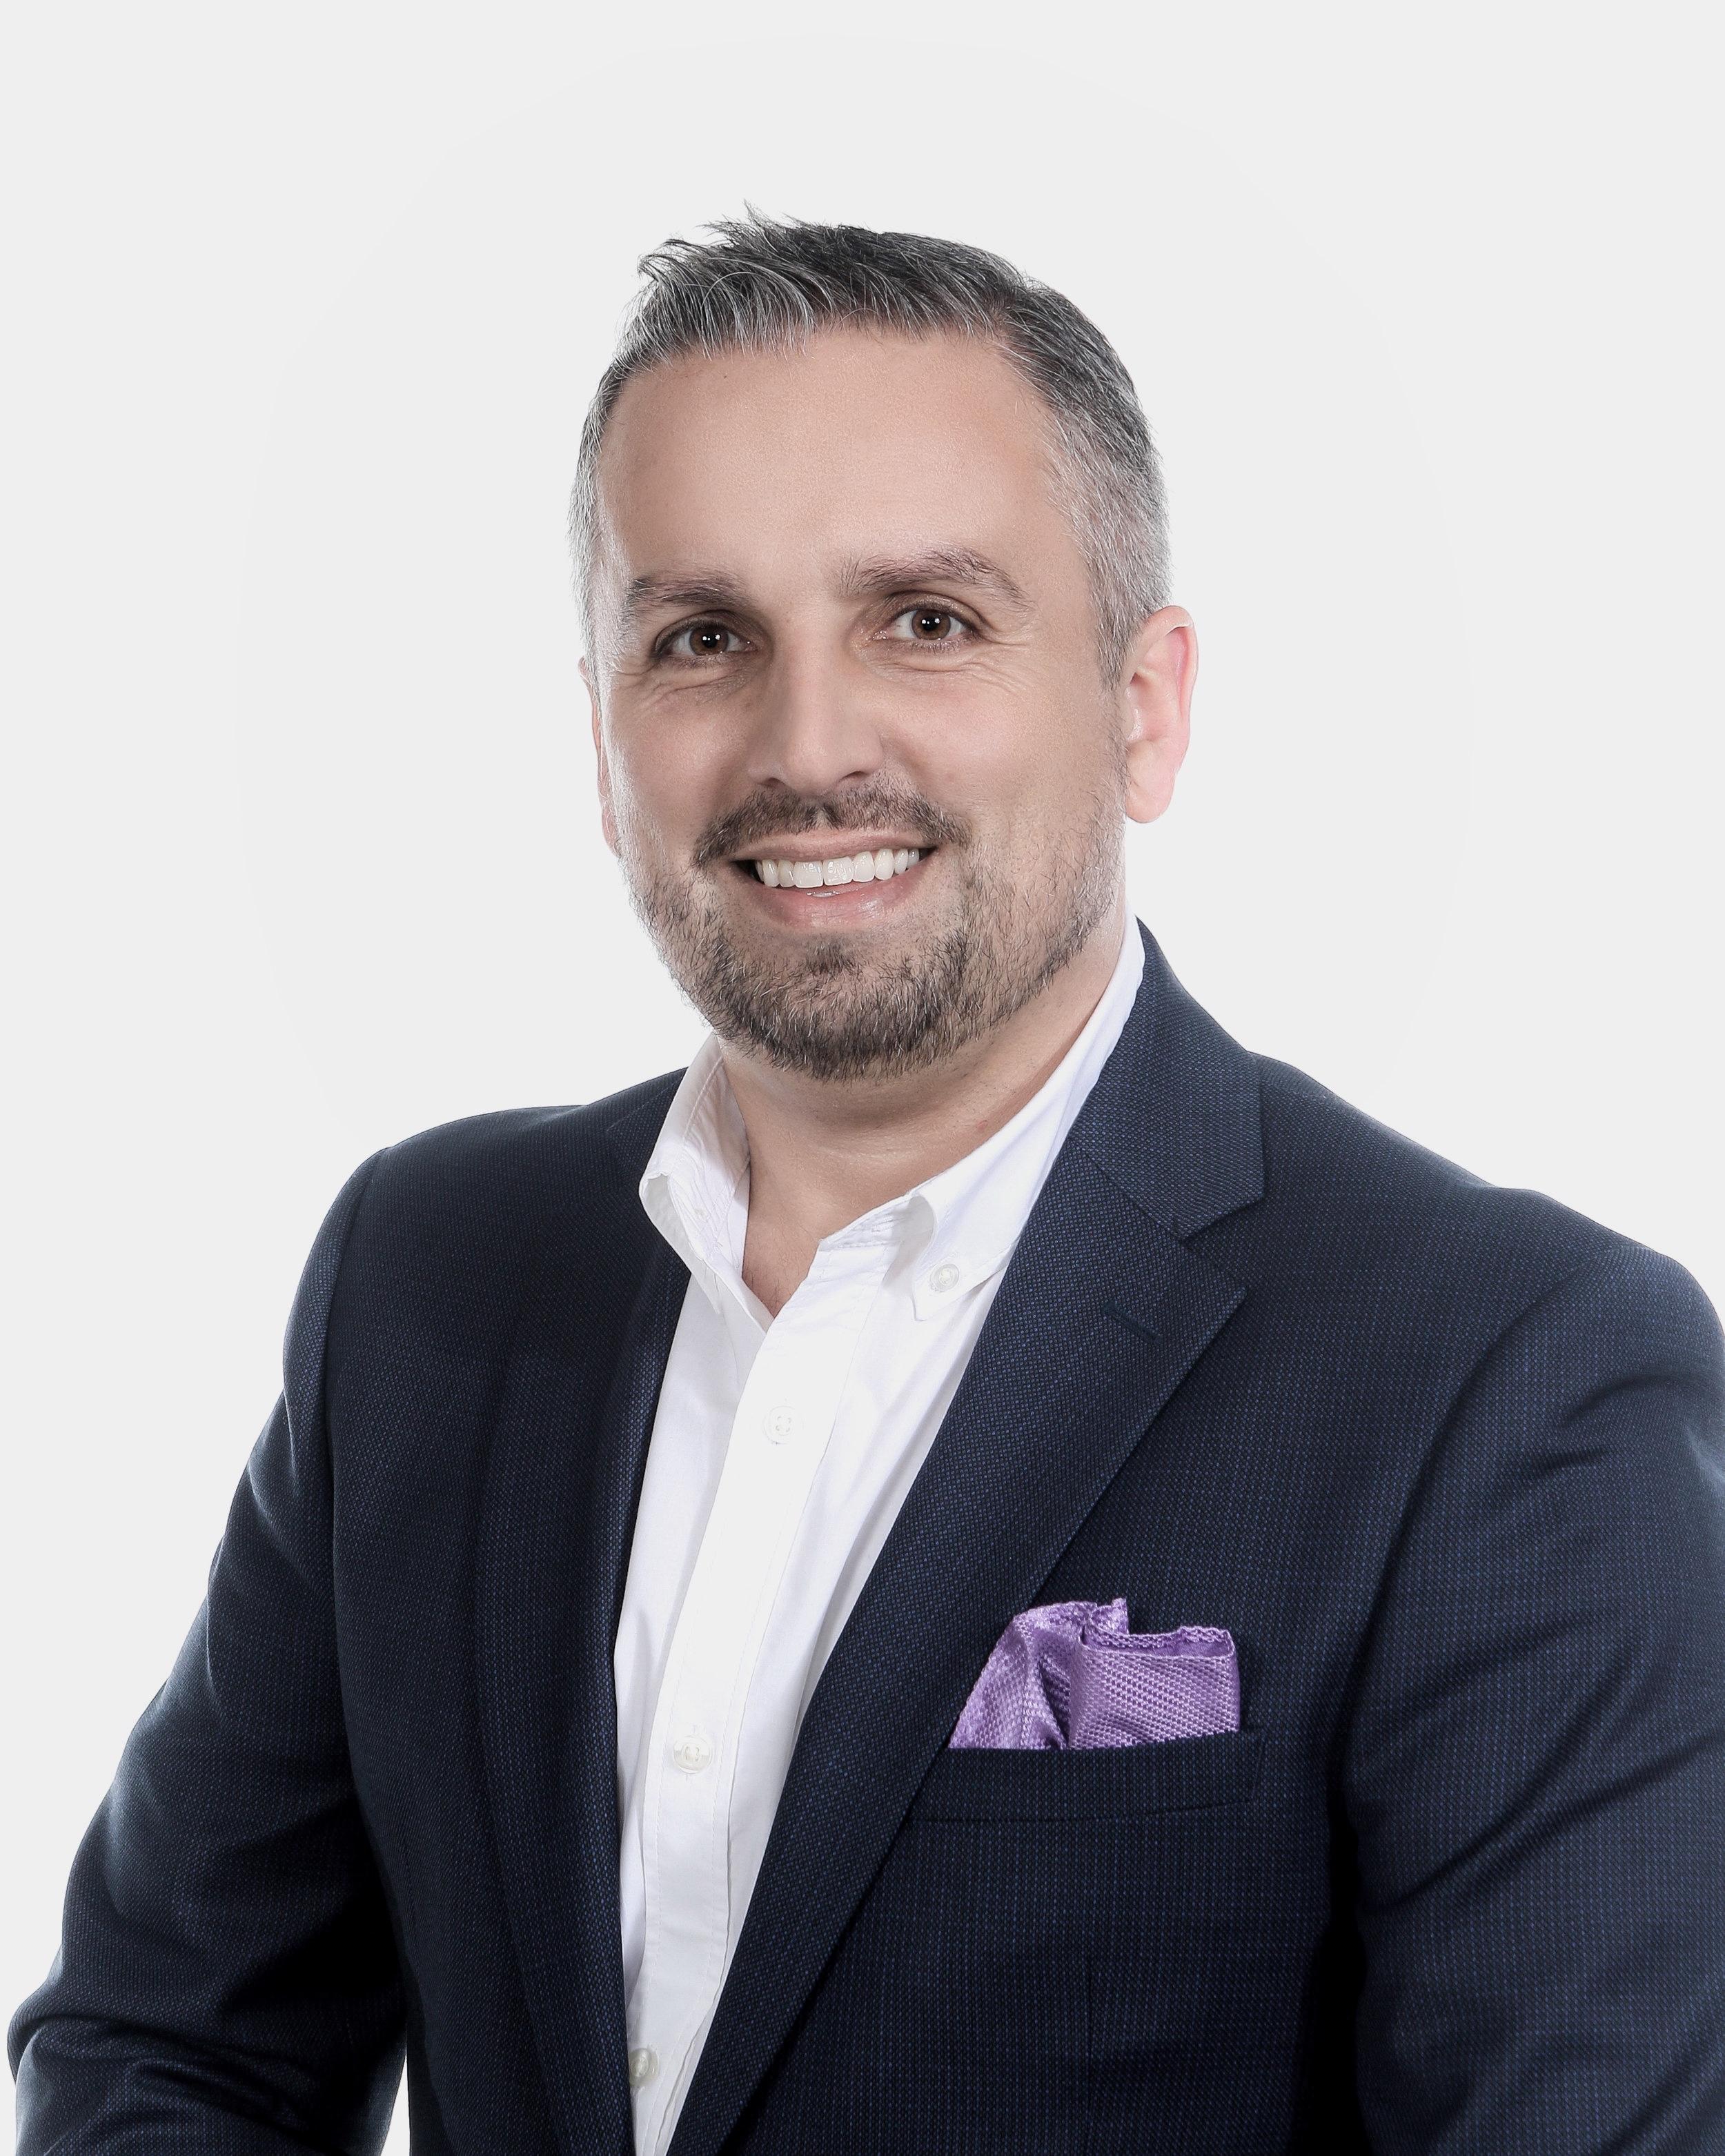 JOHN DEMOURA - Vice President, Commercial Contracting